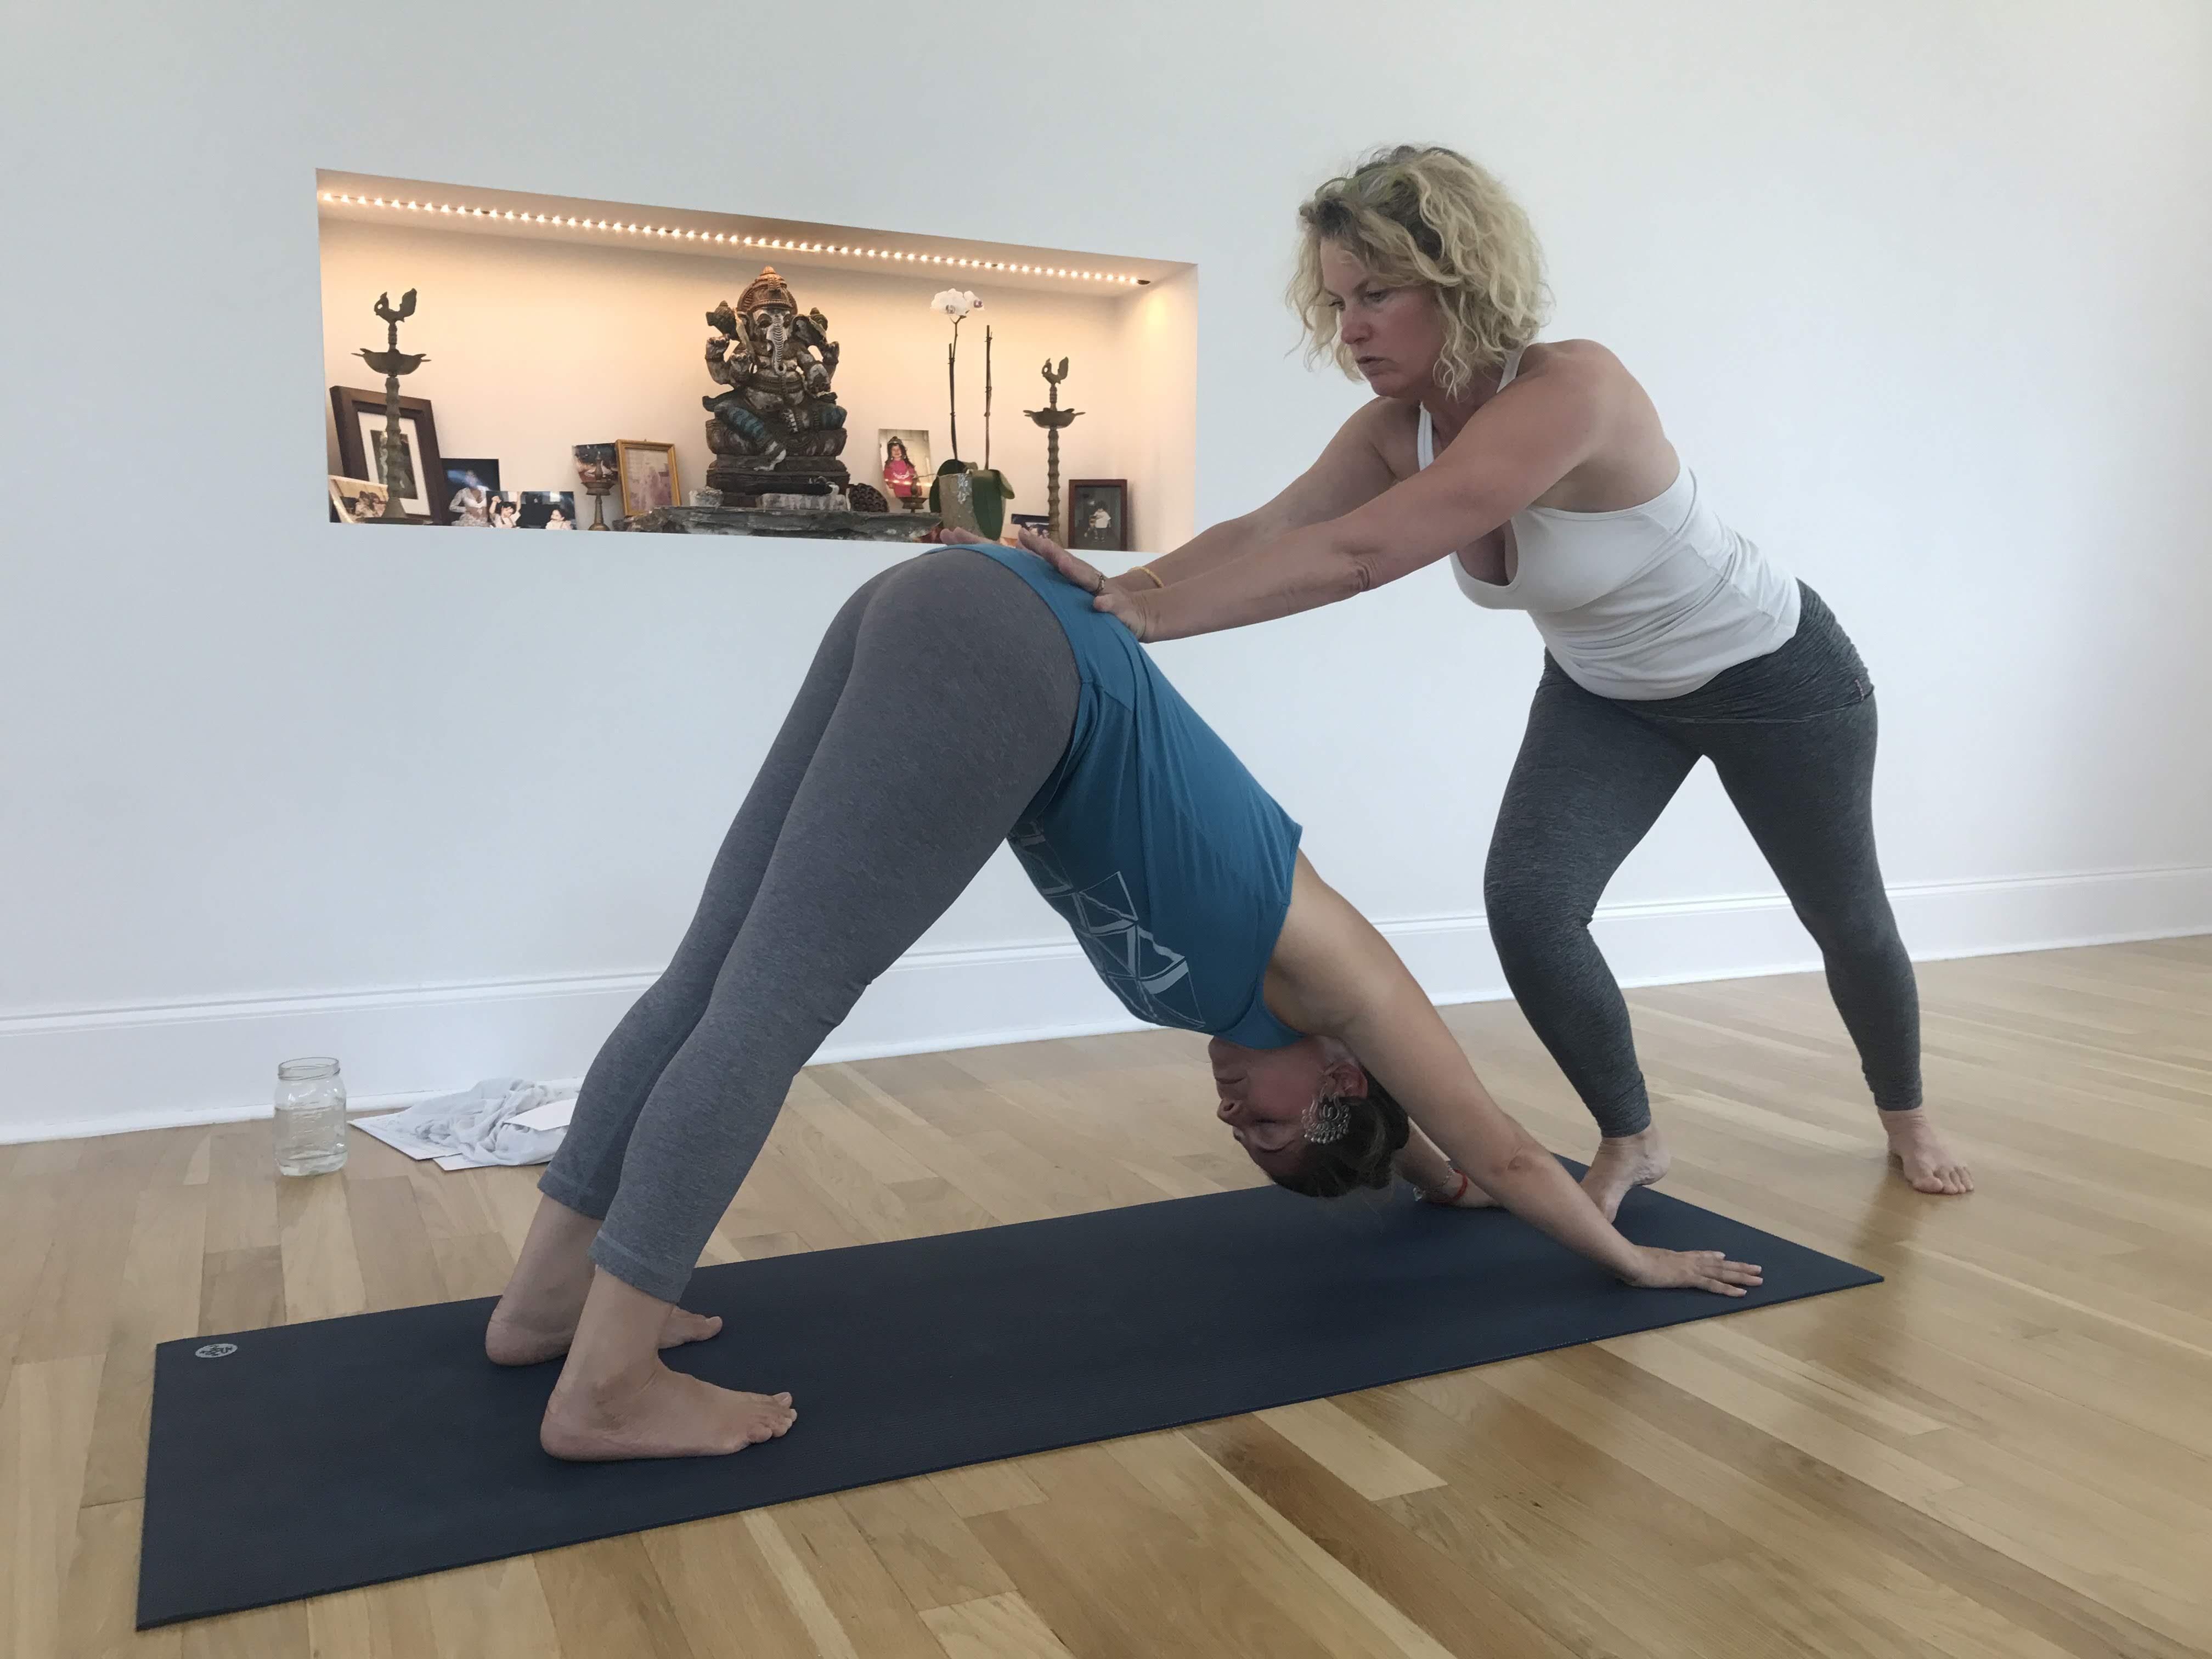 Intro To Ashtanga Course with Melanie! - Ashtanga Yoga Room